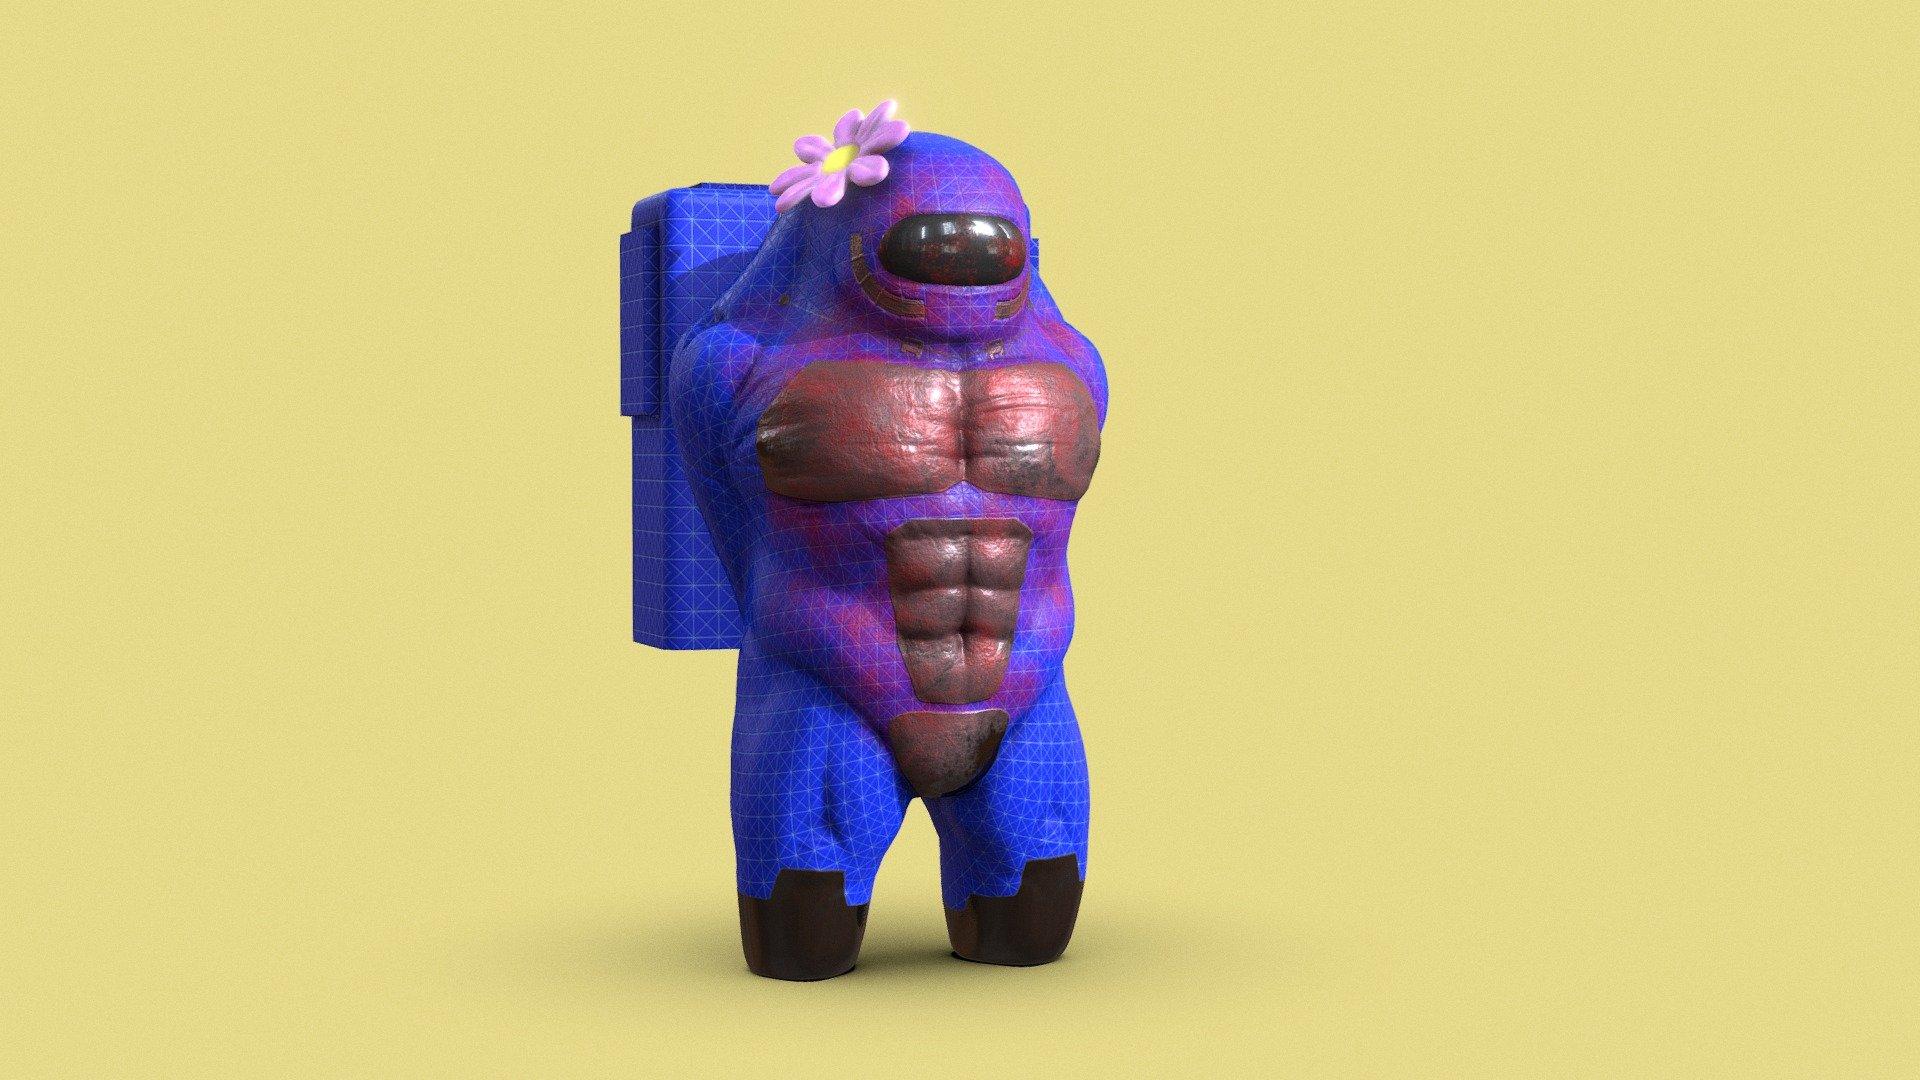 IMPOSTER AMONG US - Download Free 3D model by Freddy Drabble (@FredDrabble) [38676e9] - Sketchfab